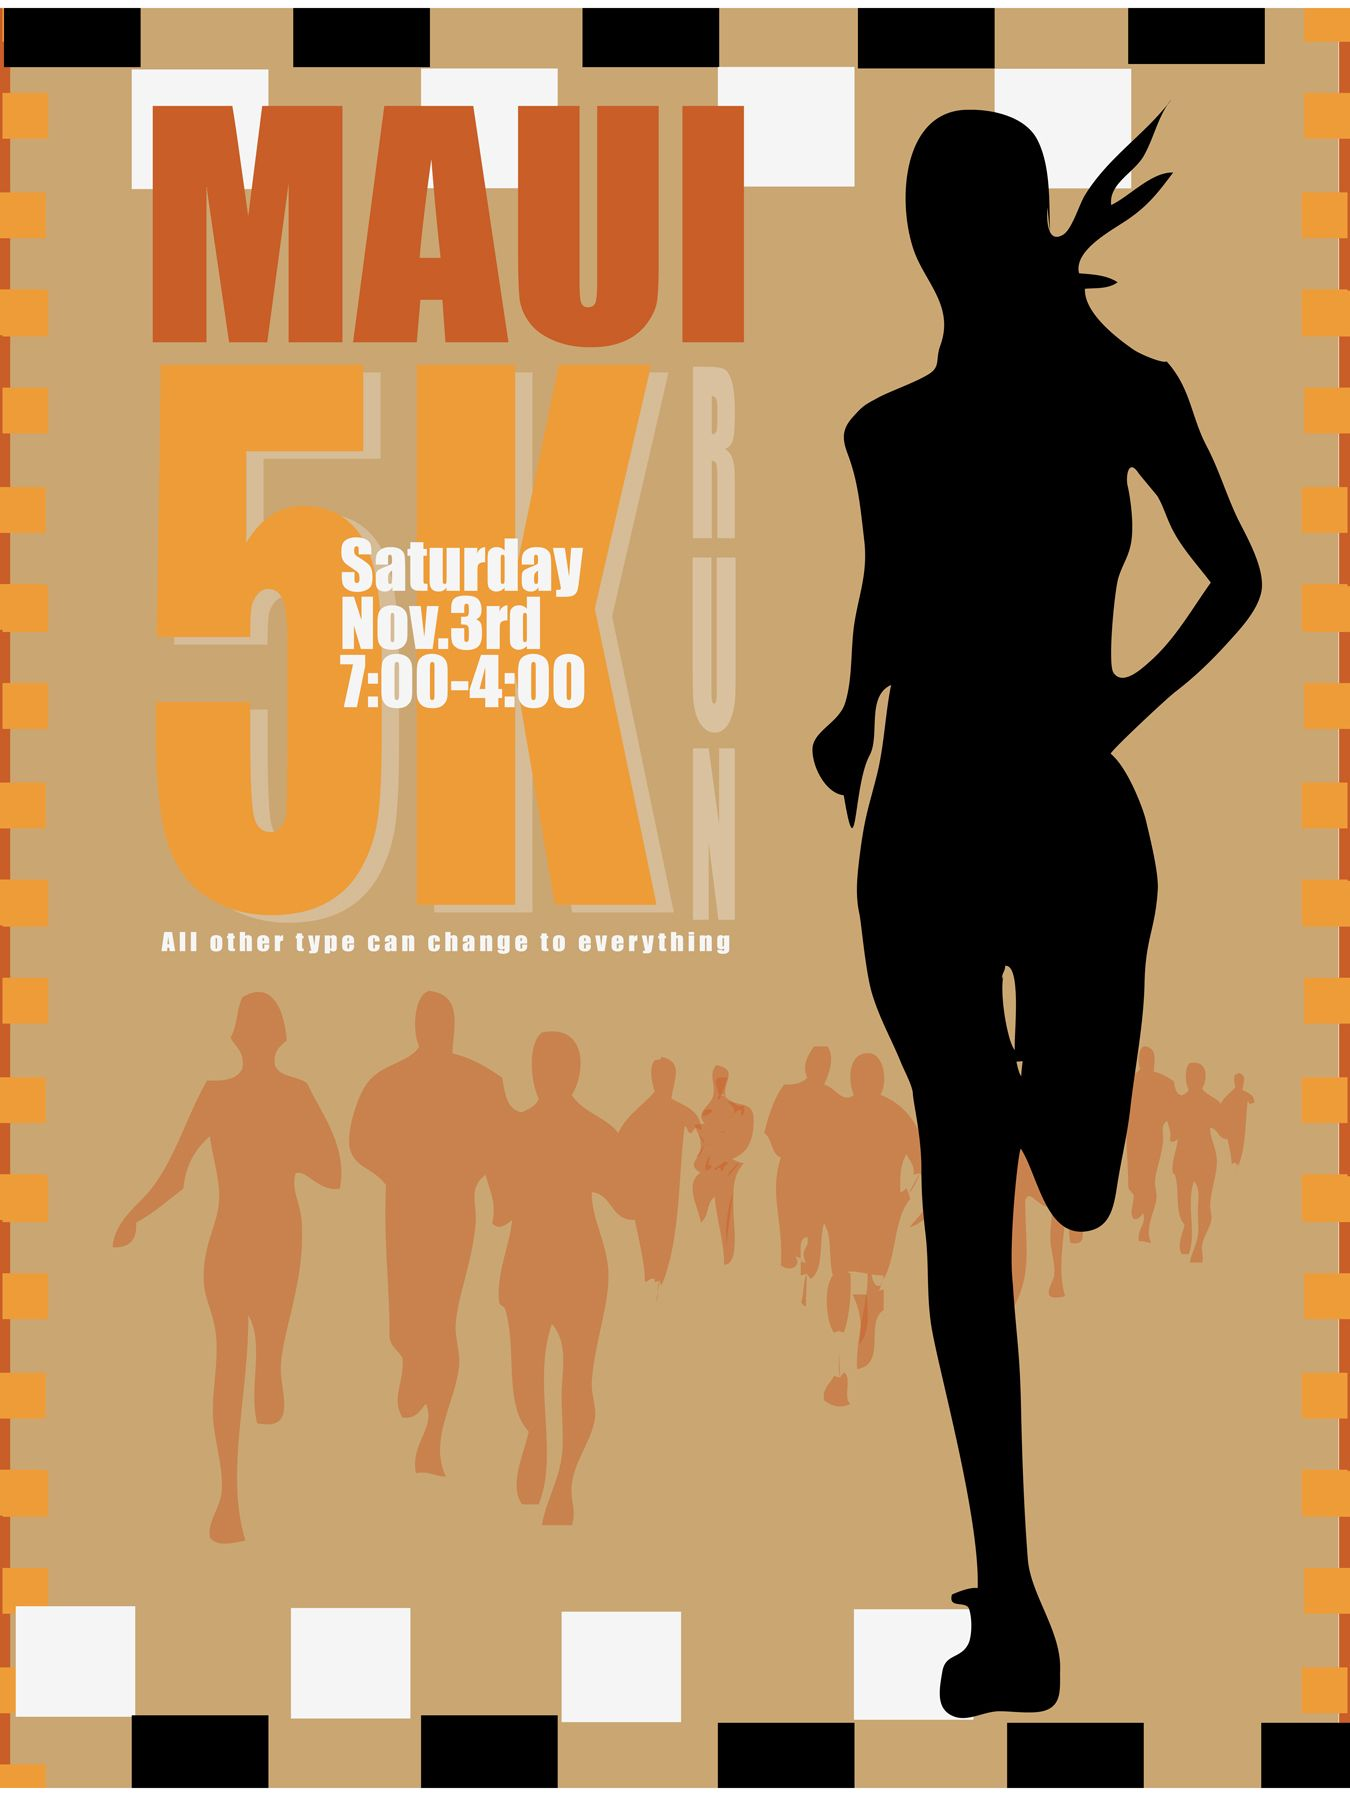 Maui 5k Run Poster Mofo Illustration Design